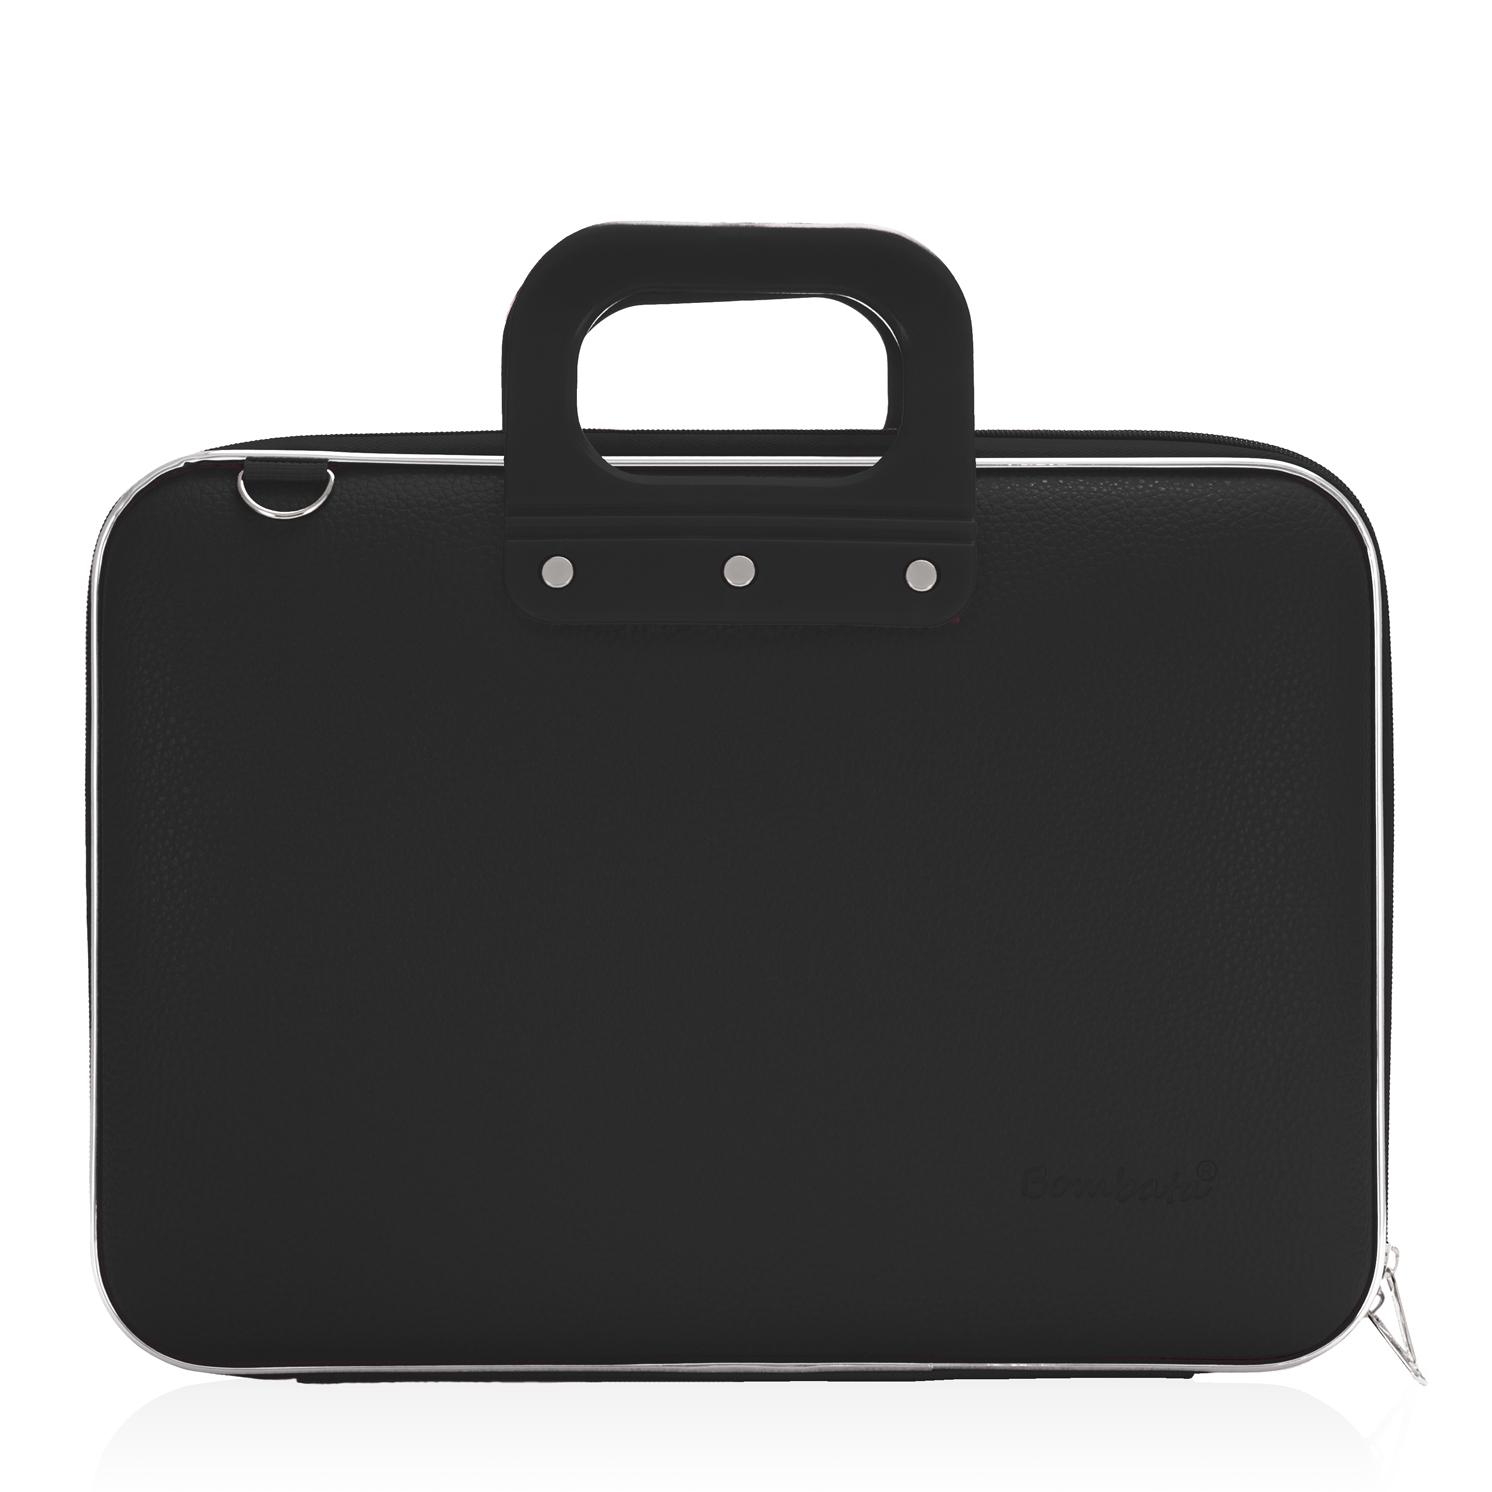 Bombata – Black Medio Classic 13″ Laptop Case/Bag with Matching Shoulder Strap